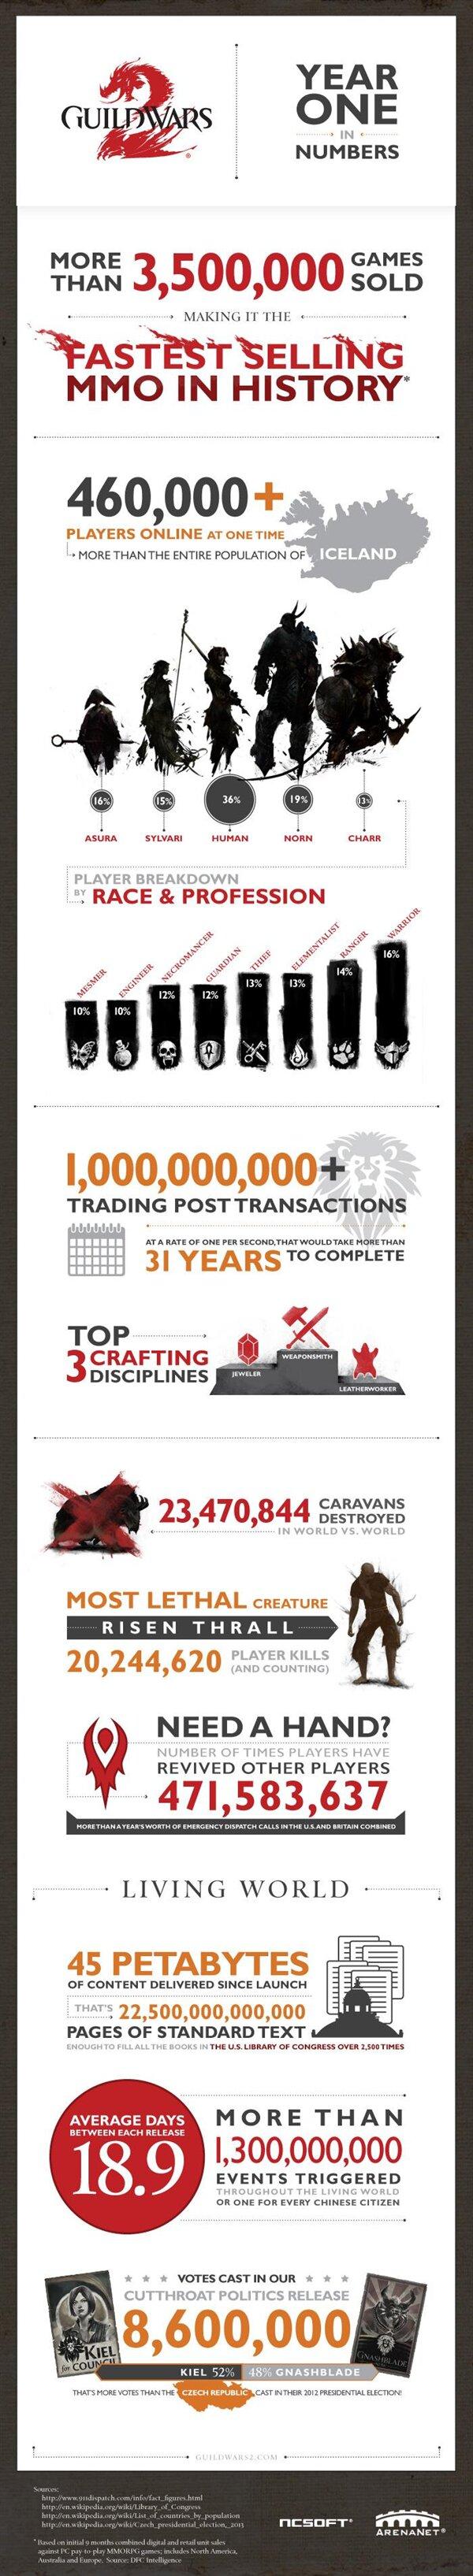 Infographie anniversaire Guild Wars 2